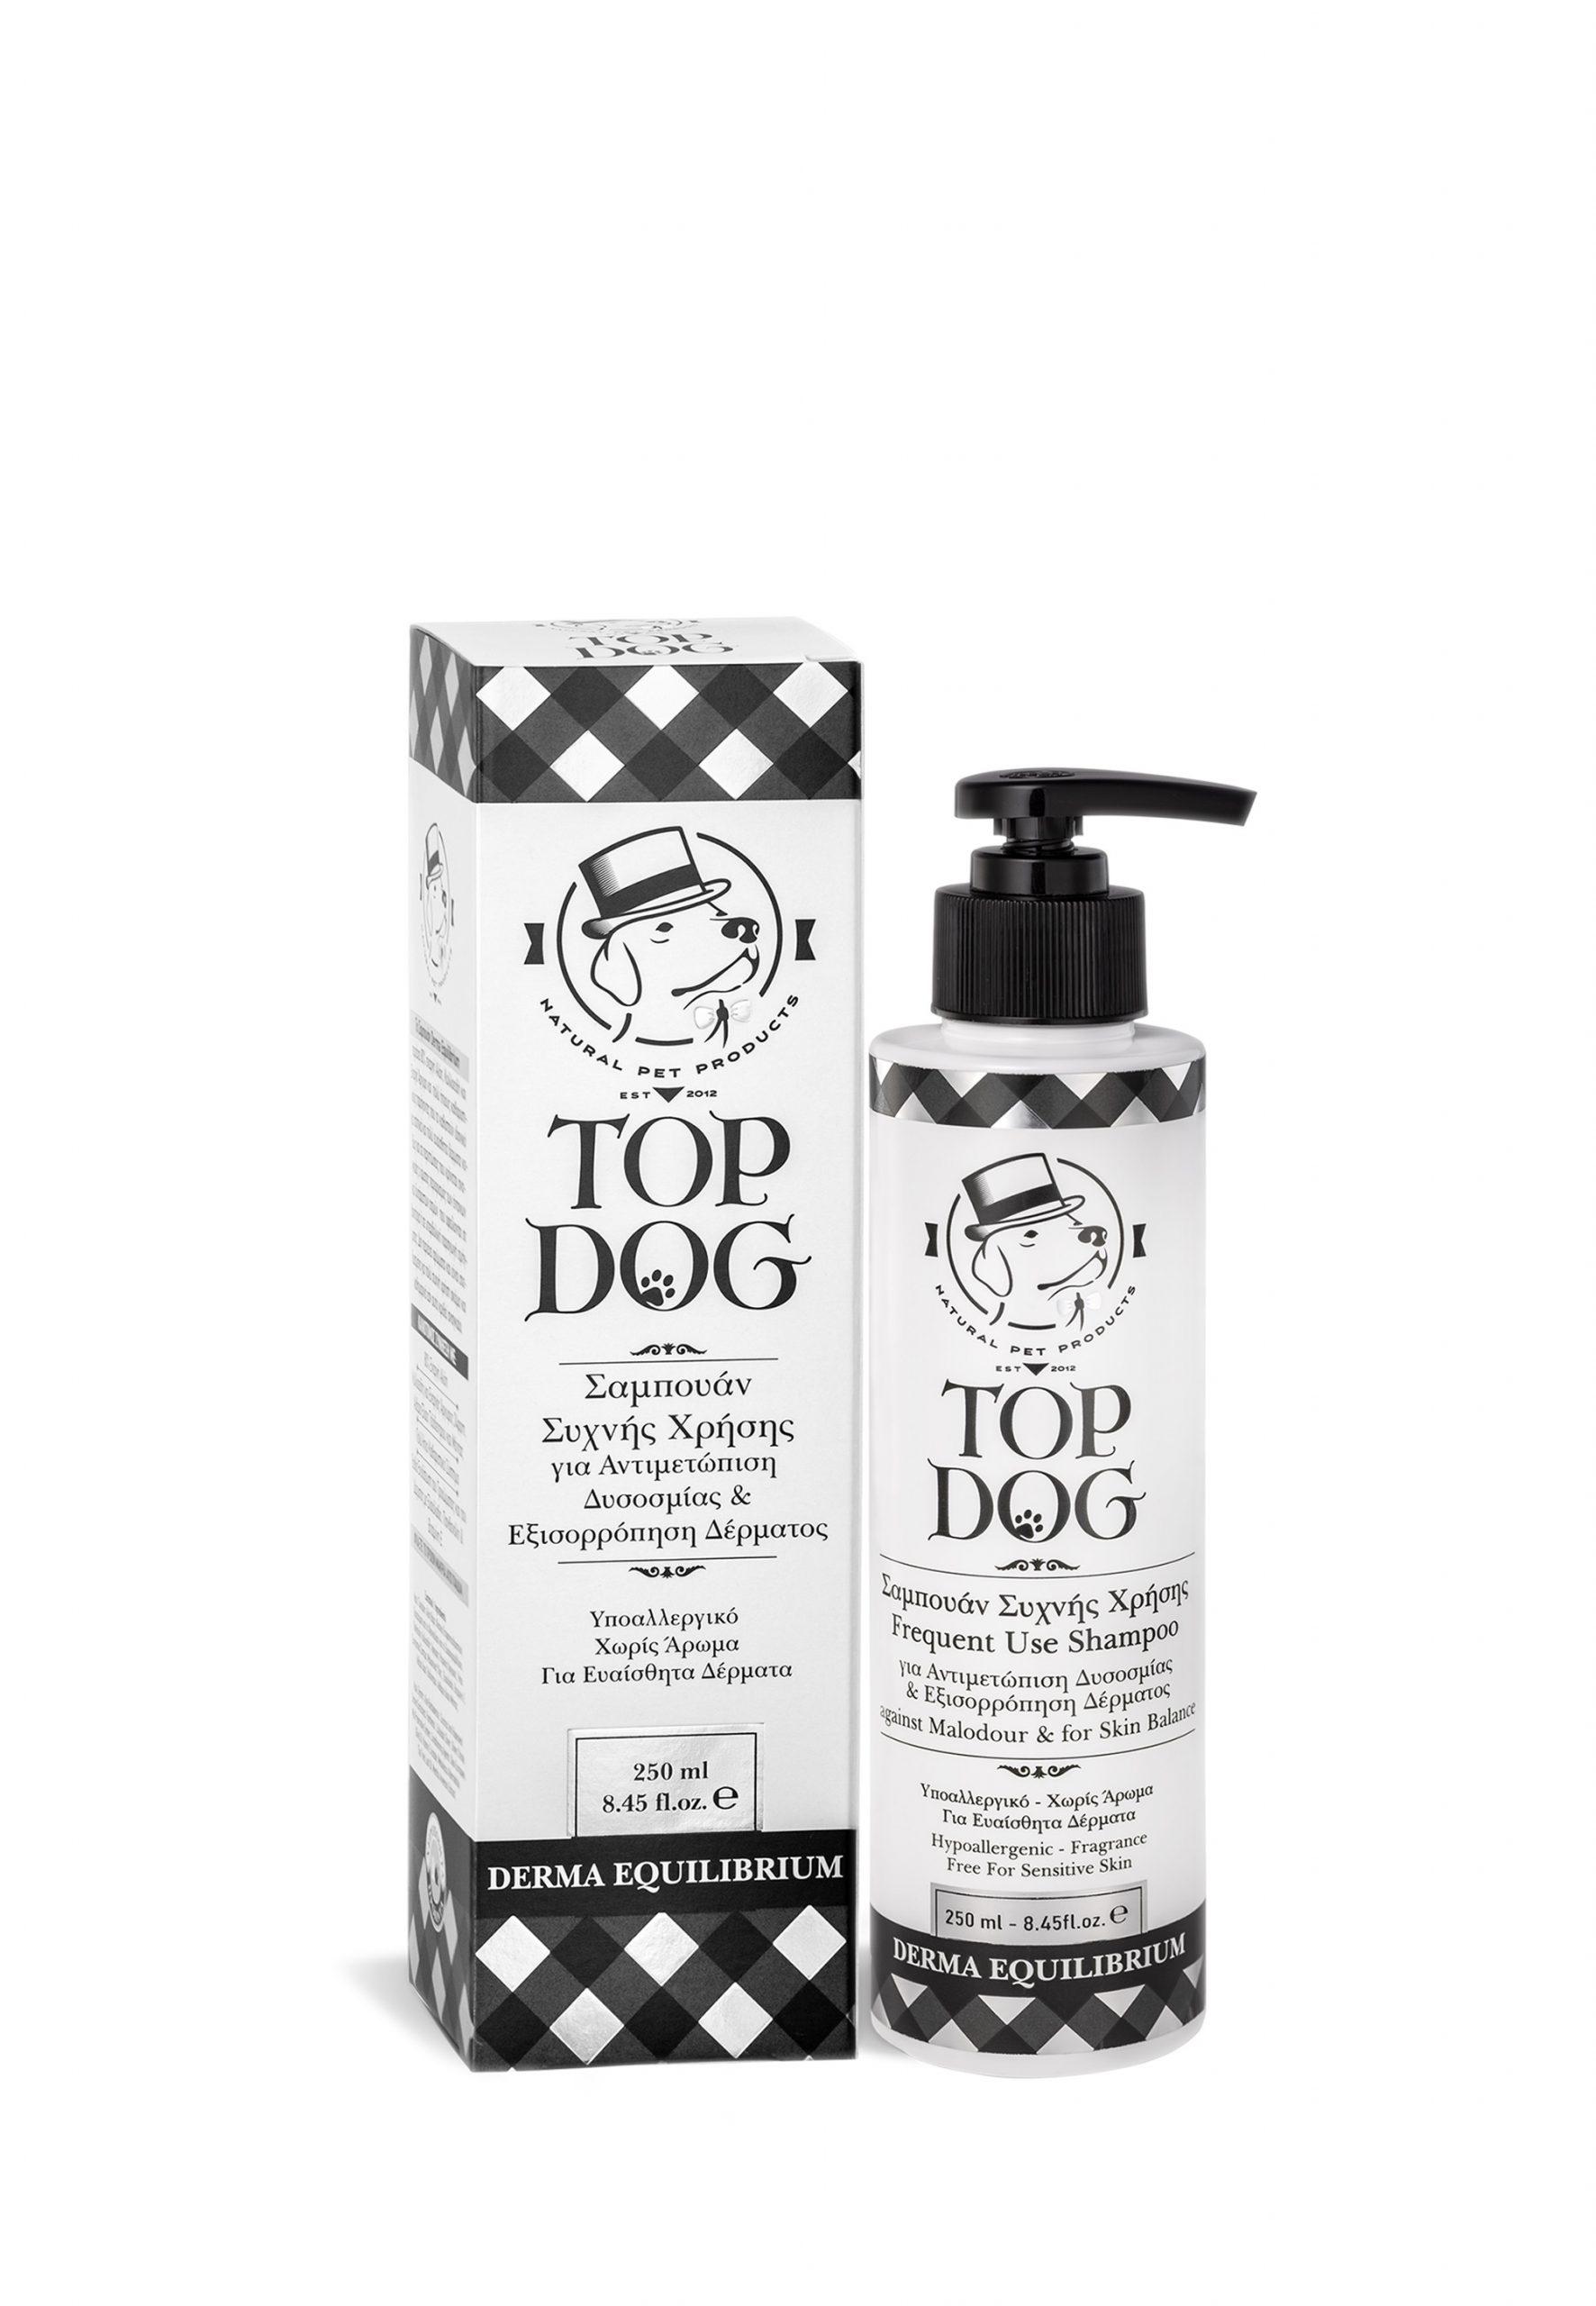 Top Dog Derma Equilibrium 250ml